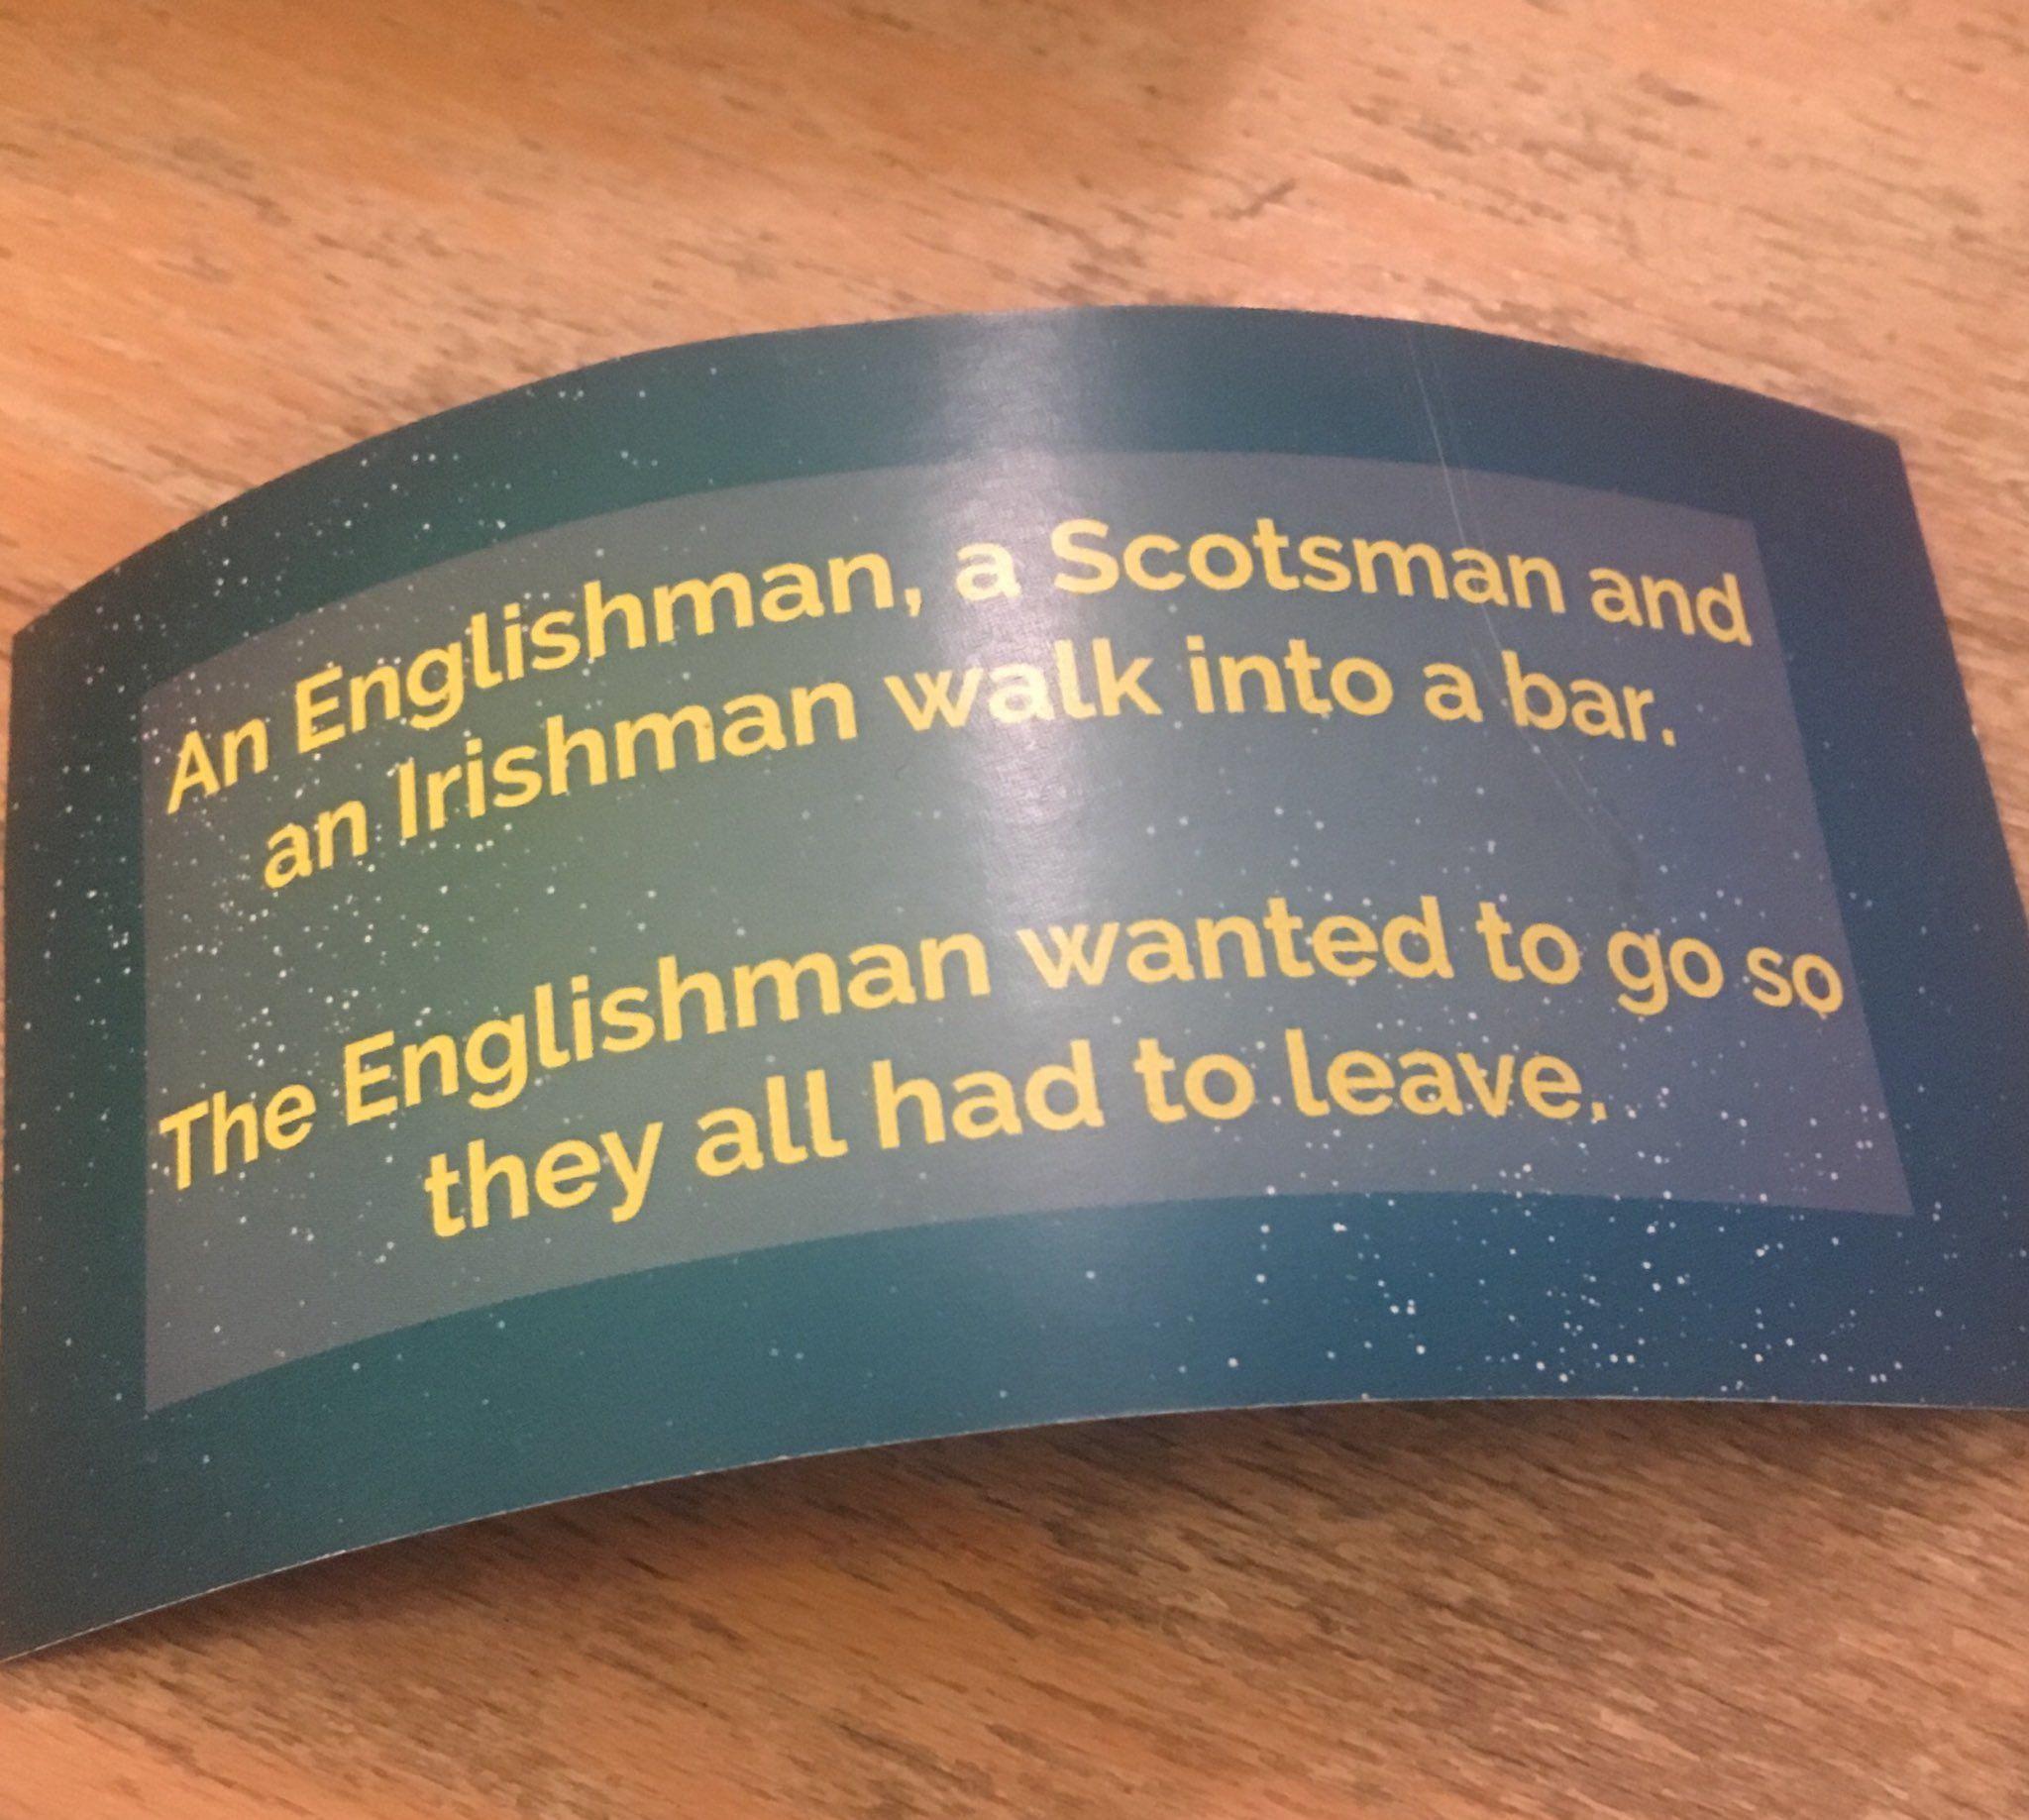 An Englishman, a Scotsman and an Irishman walk into a bar...